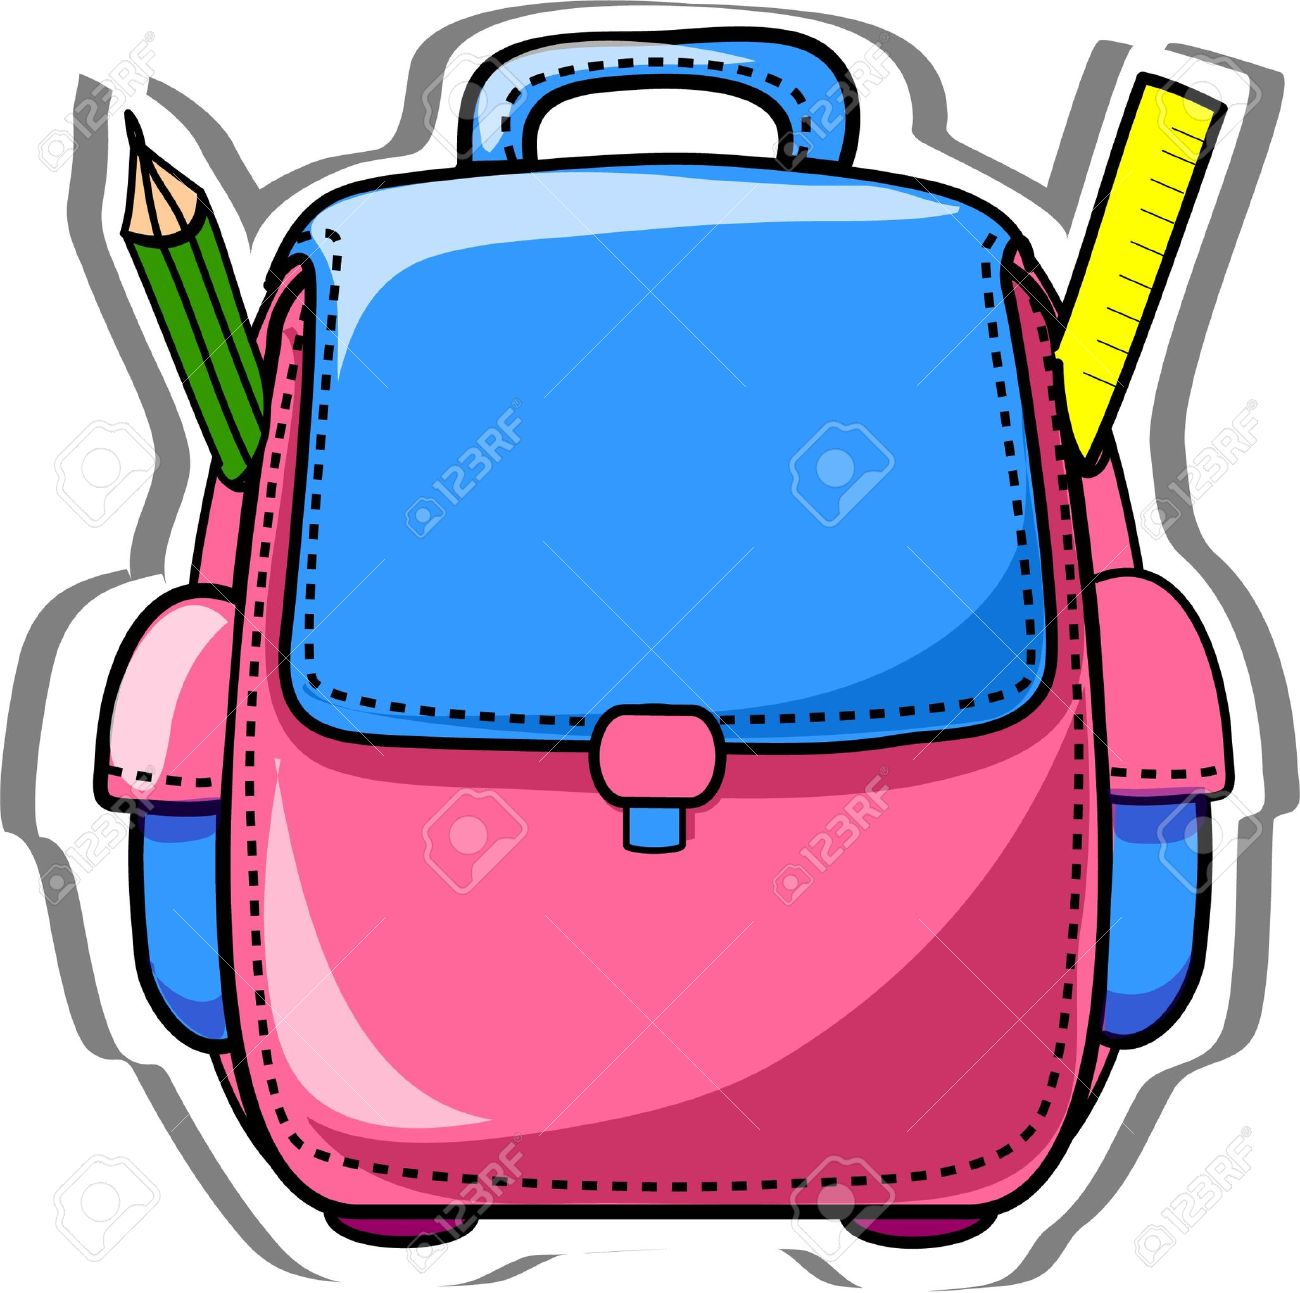 12,206 Book Bag Cliparts, Stock Vector And Royalty Free Book Bag ...